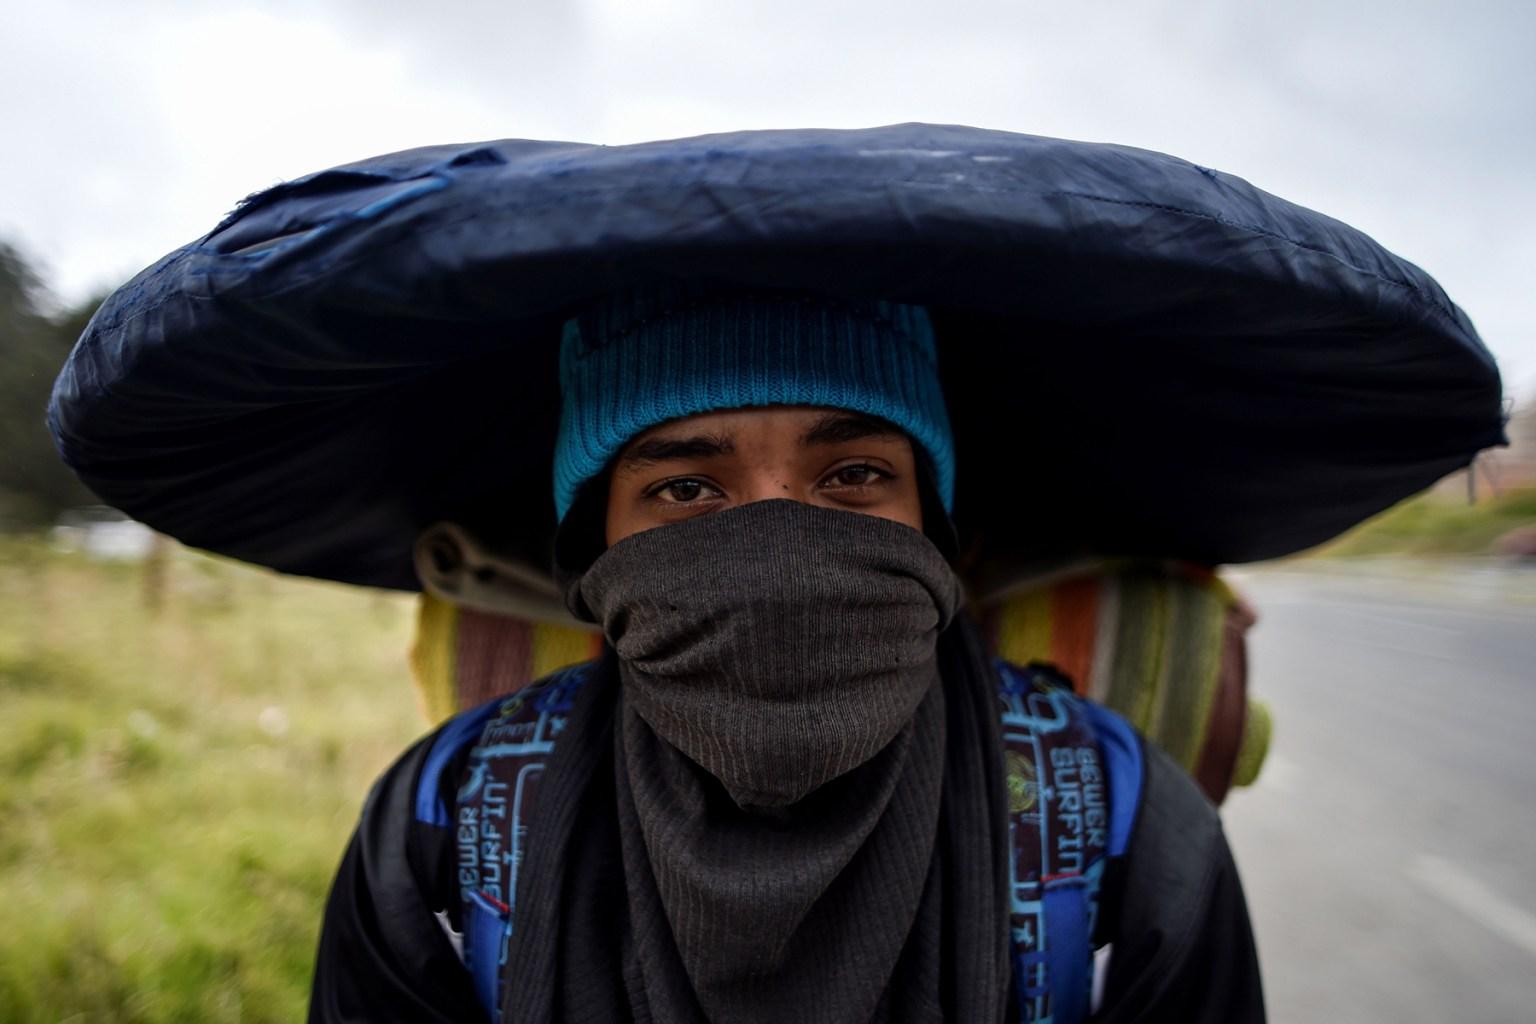 A Venezuelan migrant carries his belongings along the Pan-American Highway in Tulcan, Ecuador, on Aug. 21, 2018. LUIS ROBAYO/AFP/Getty Images